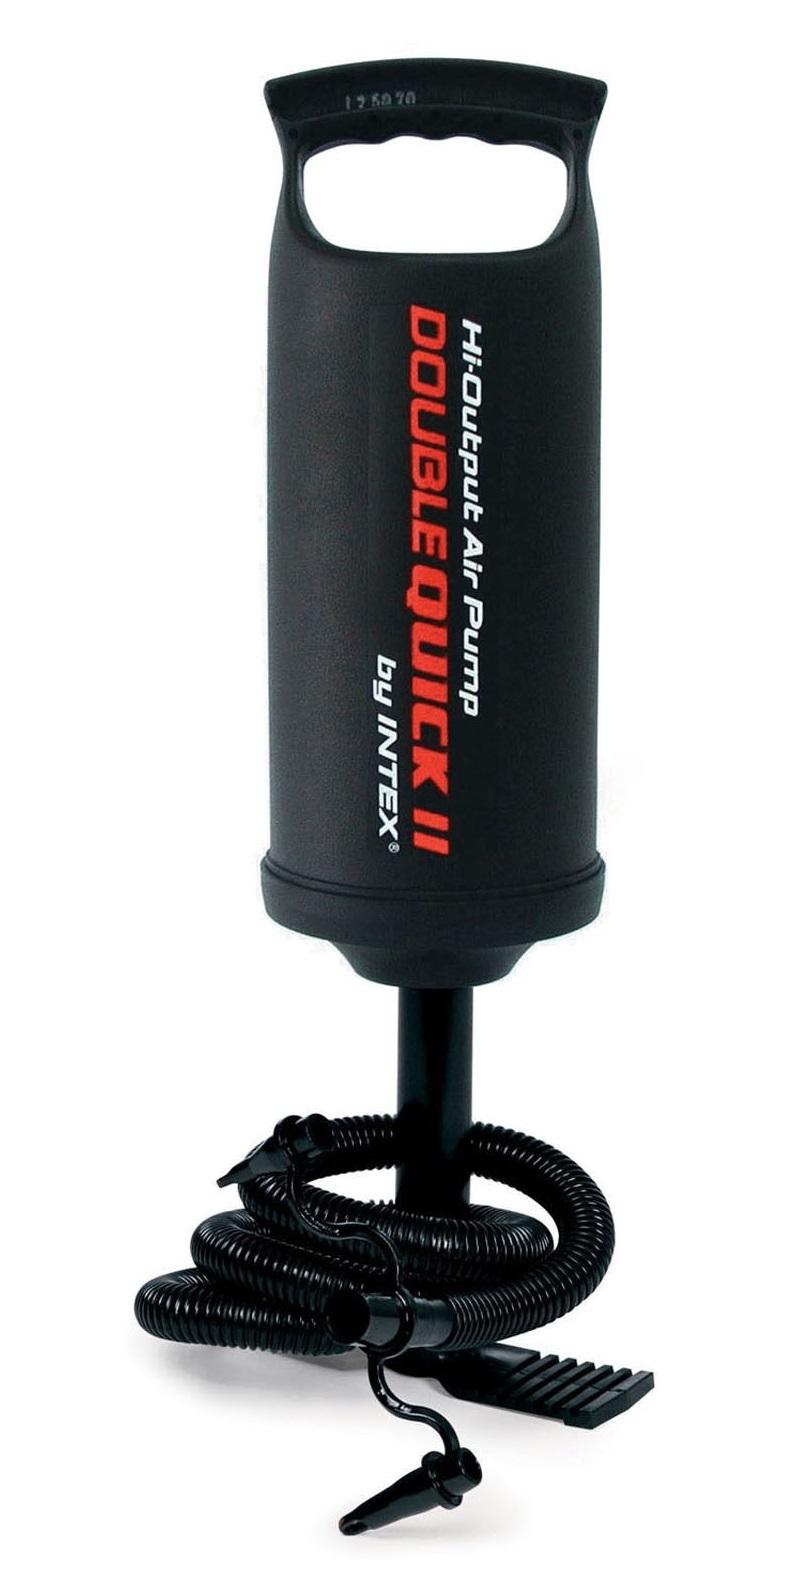 Intex: Double Quick II - Hand Pump image